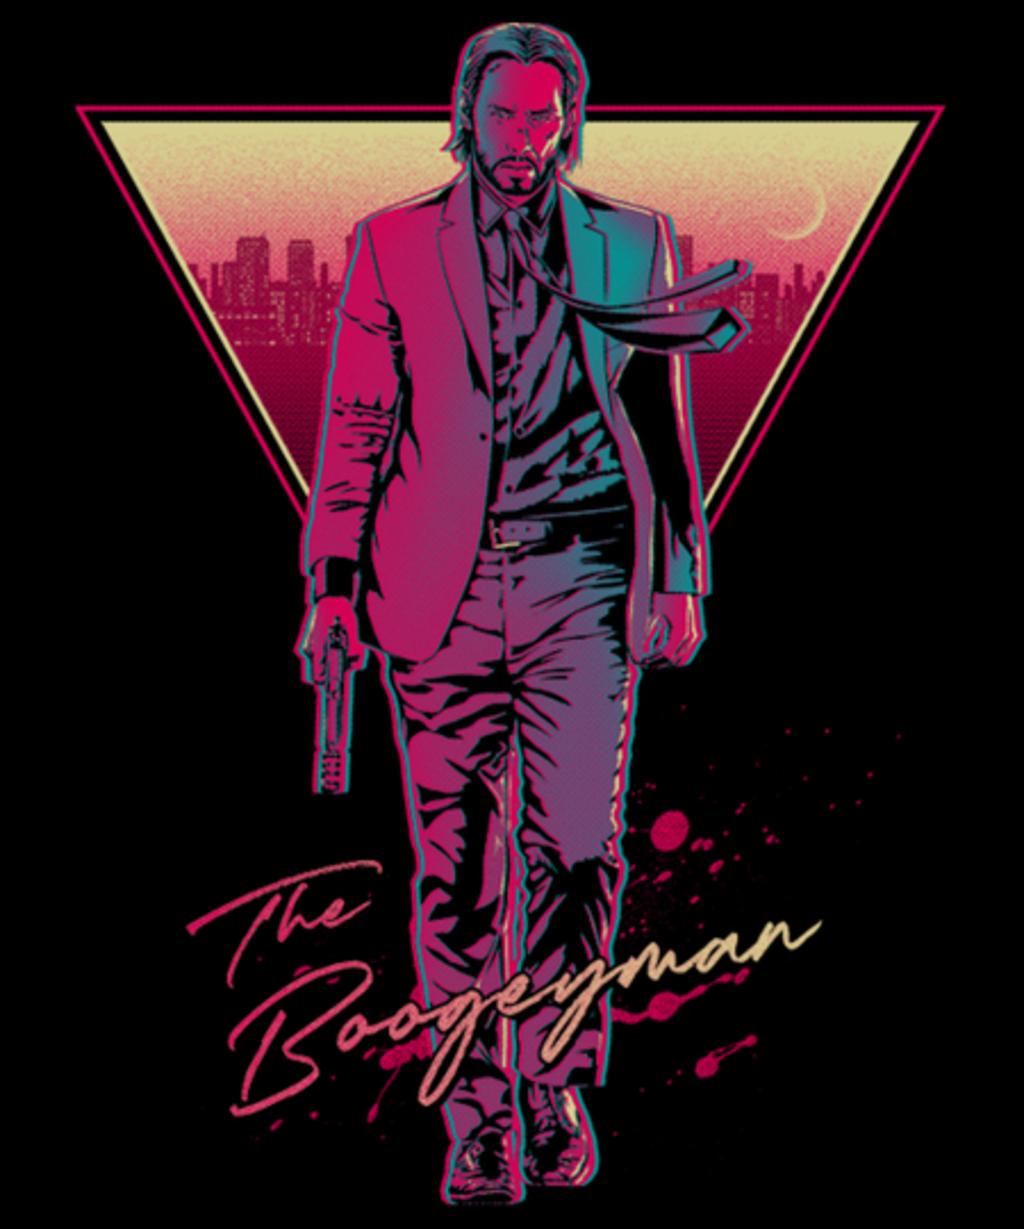 Qwertee: The Boogeyman